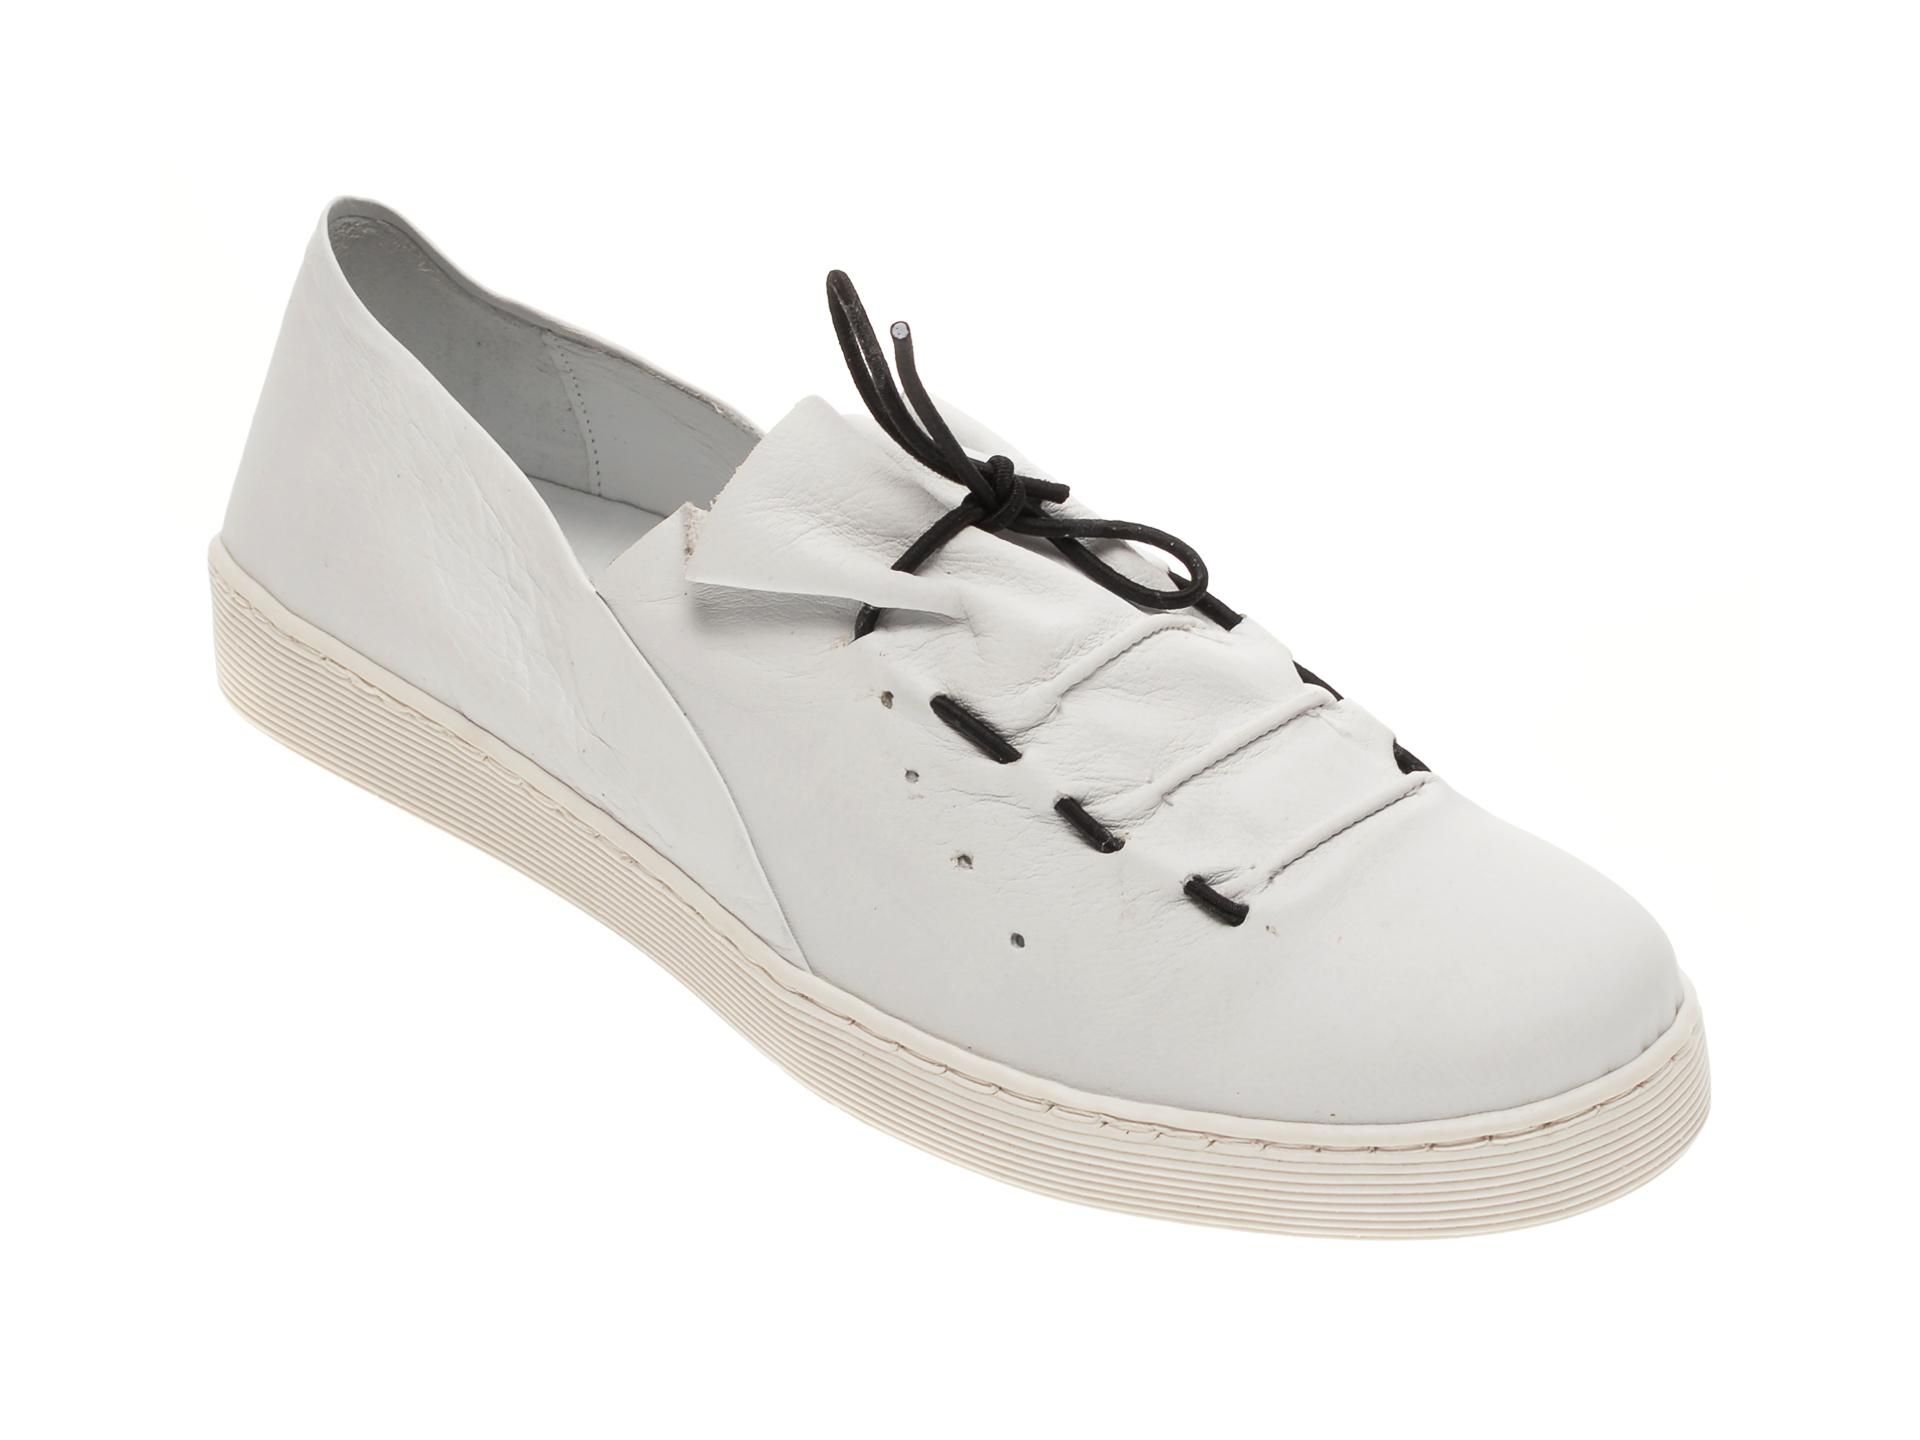 Pantofi BABOOS albi, R09, din piele naturala imagine